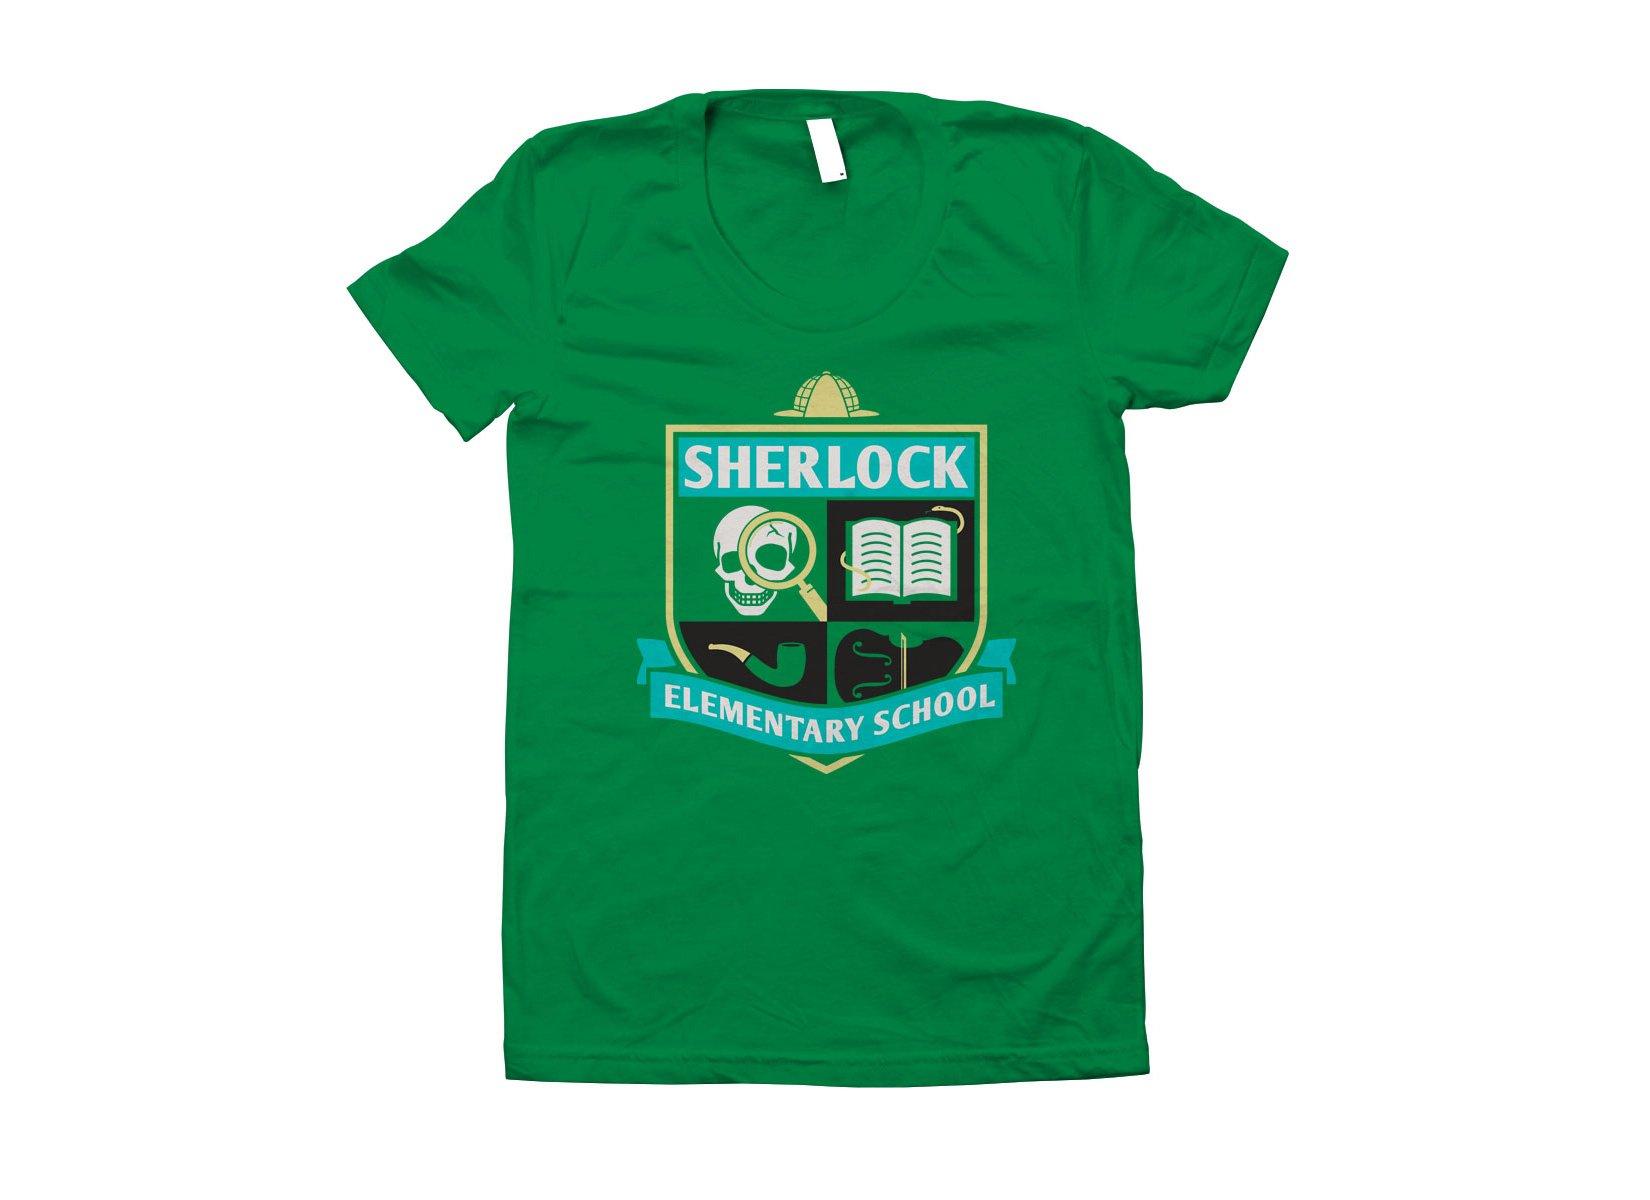 Sherlock Elementary School on Juniors T-Shirt